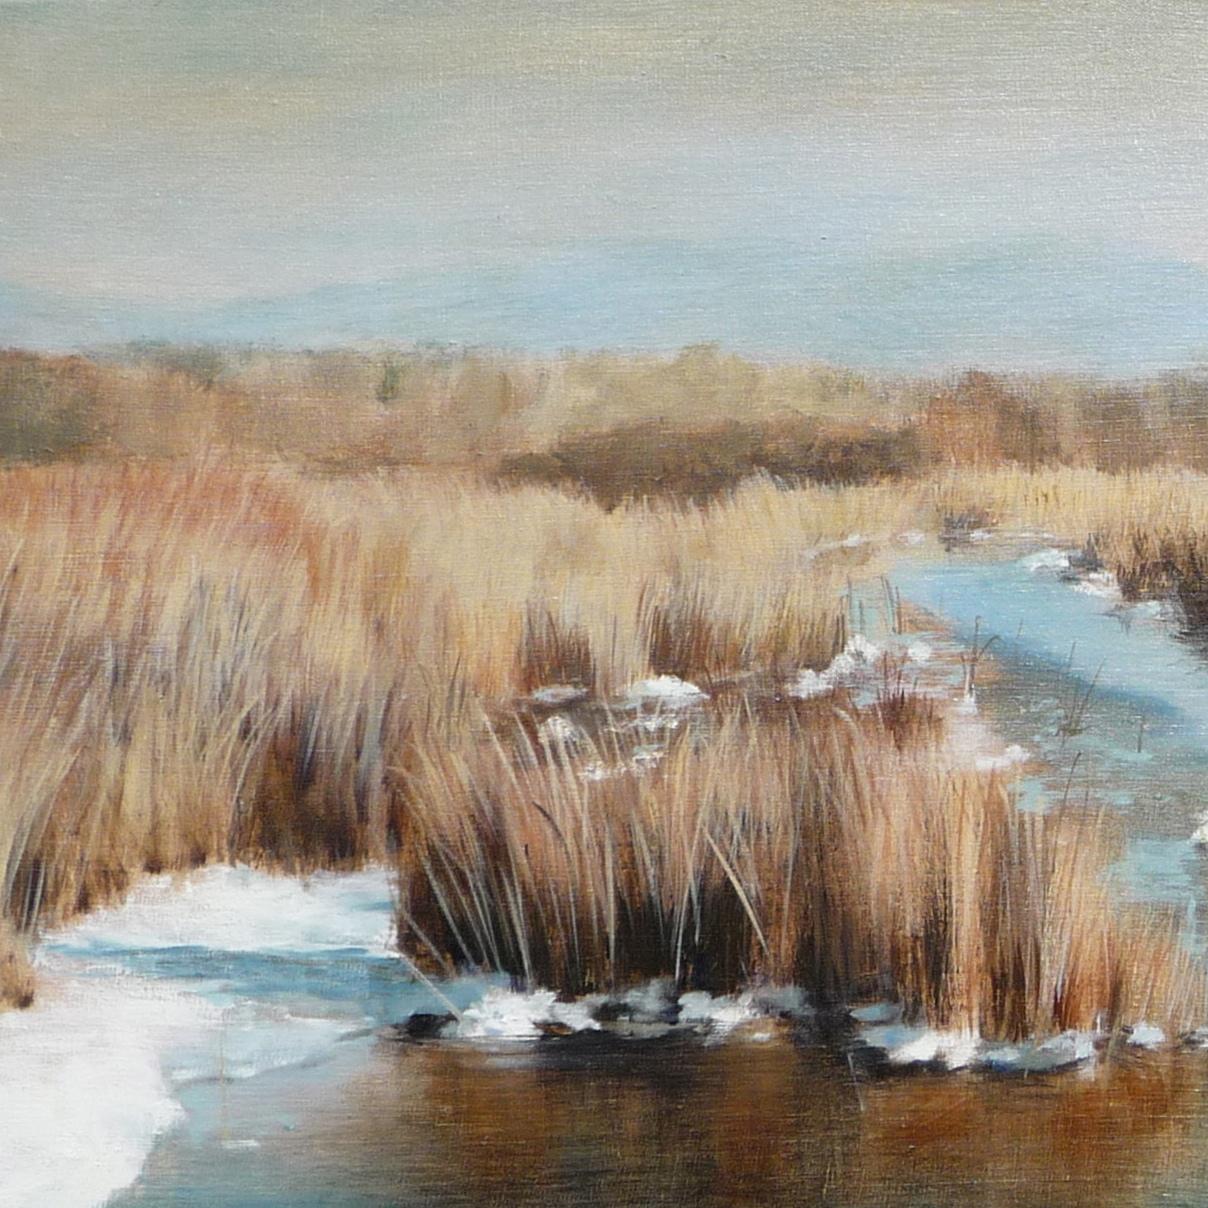 Ruthie V, Edison Slough in Snow (detail)